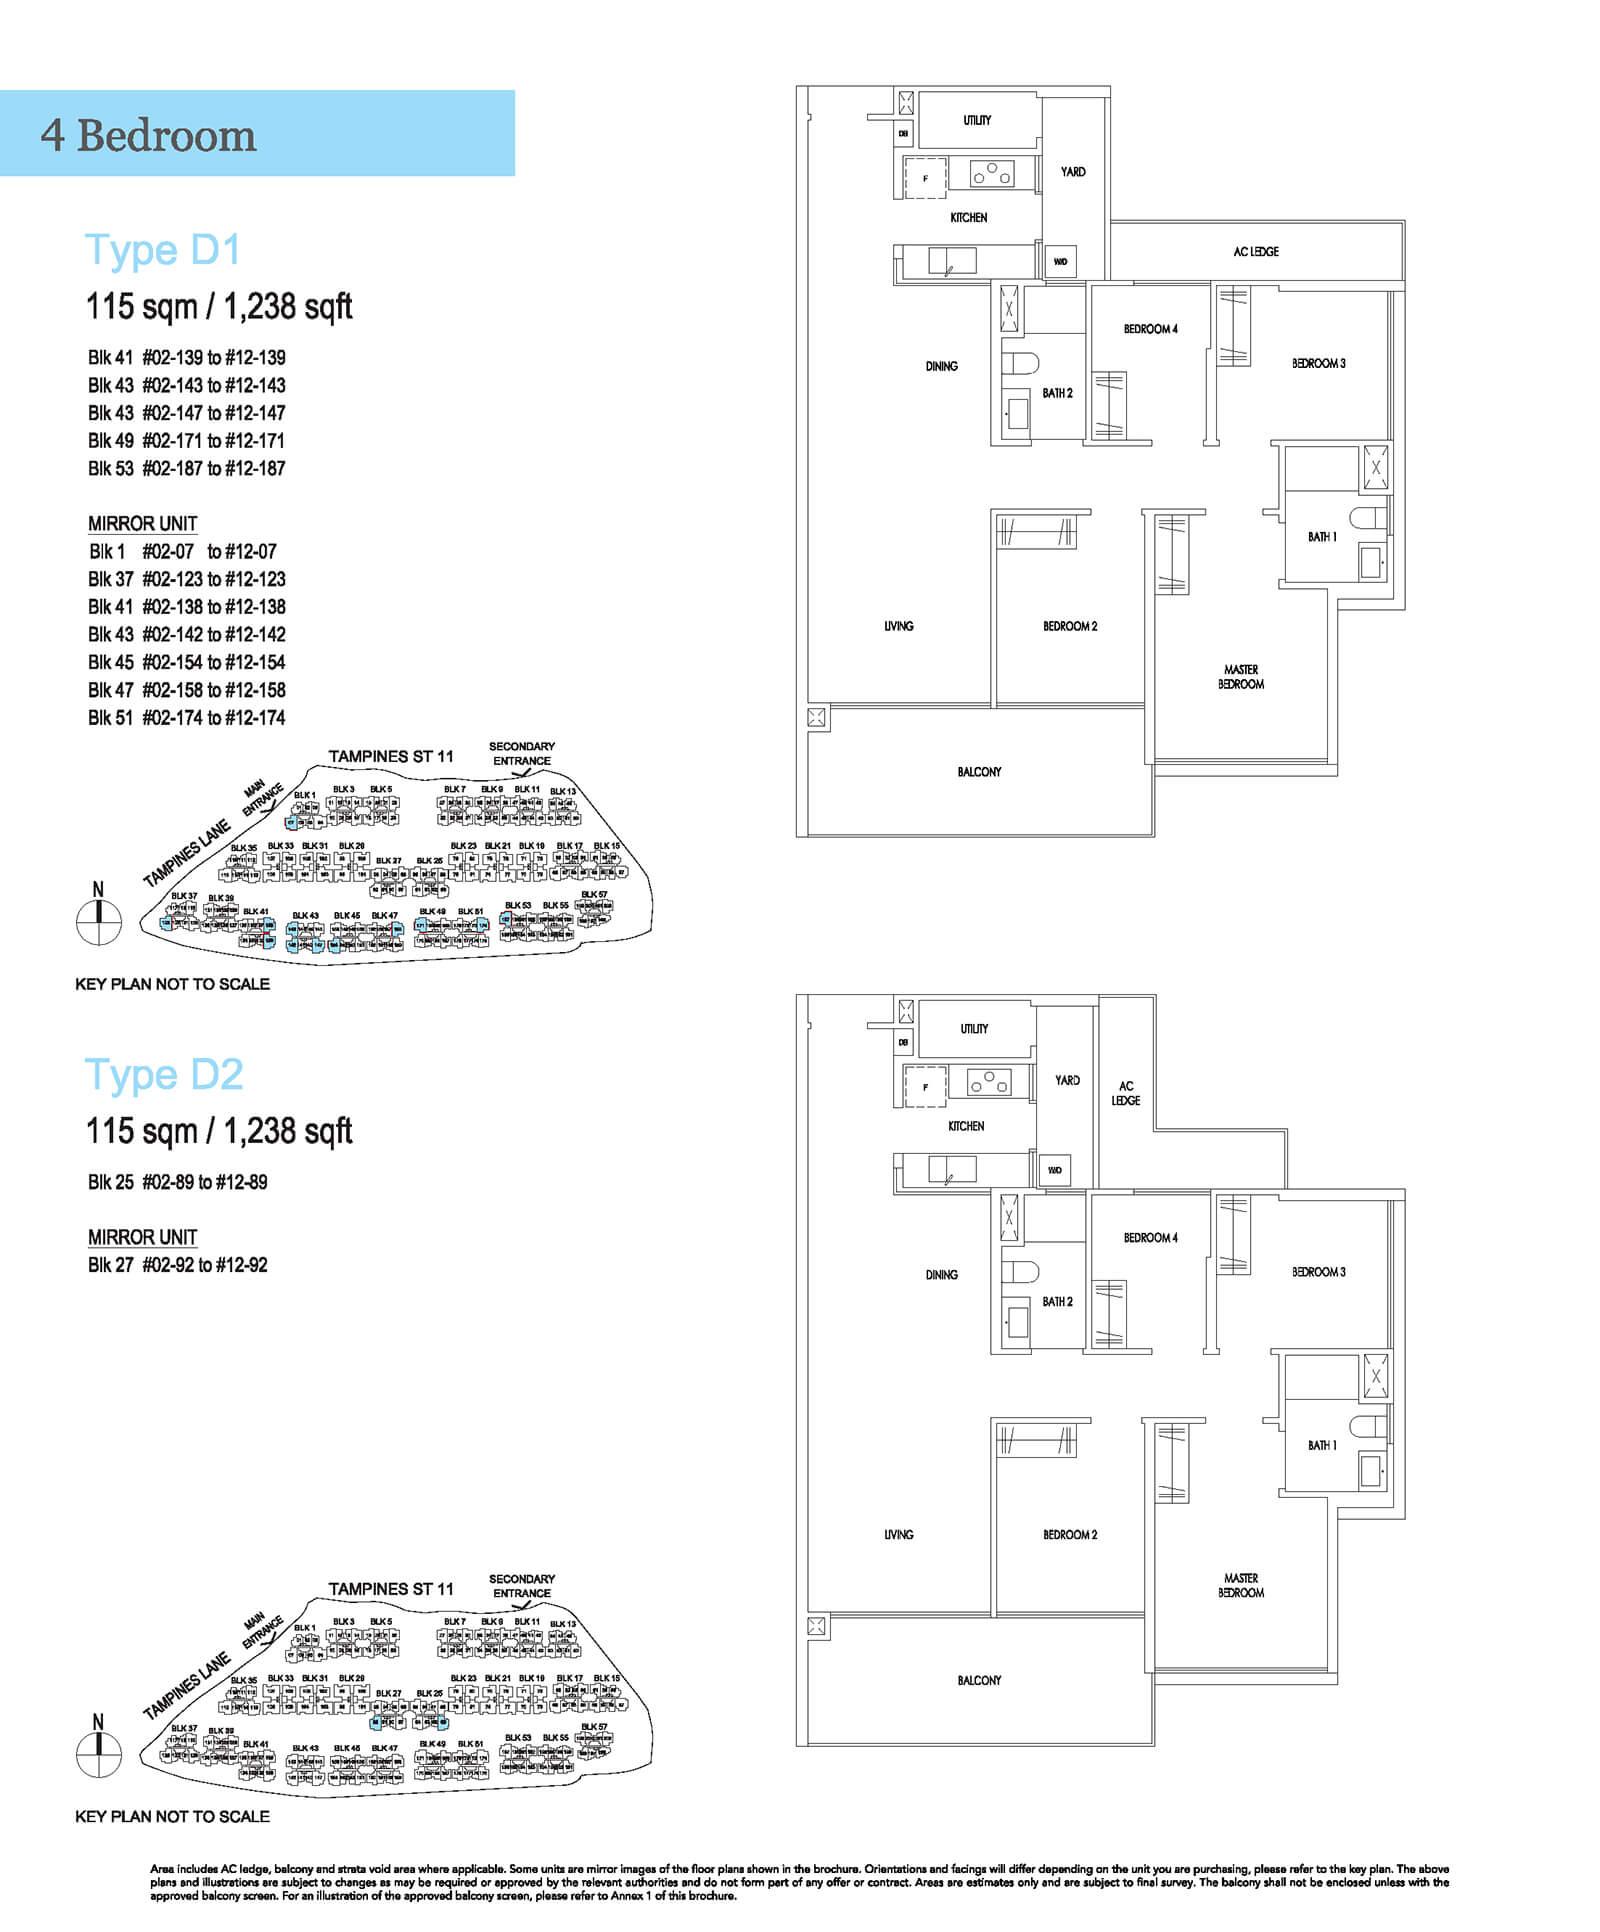 Treasure At Tampines Floor Plan 4-Bedroom D1 D2